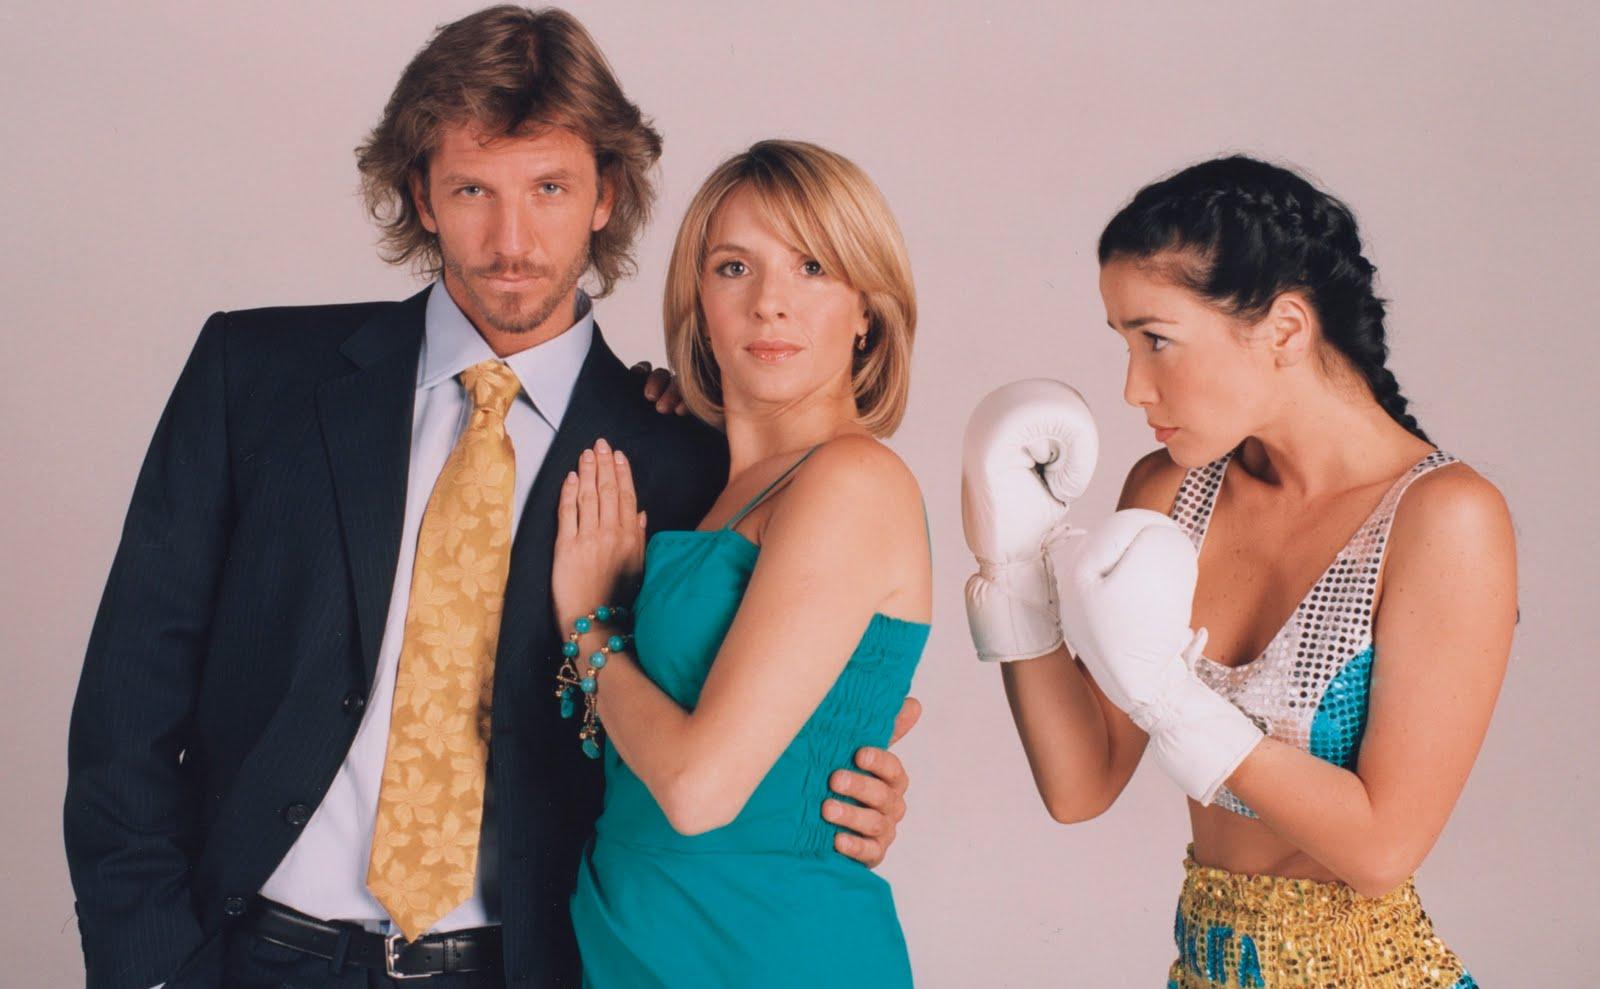 http://3.bp.blogspot.com/_JVI_zthej0M/TEBt7GEg-BI/AAAAAAAAF5I/I3ESDsKG9Eg/s1600/Facundo-Natalia+y+Carla.jpg